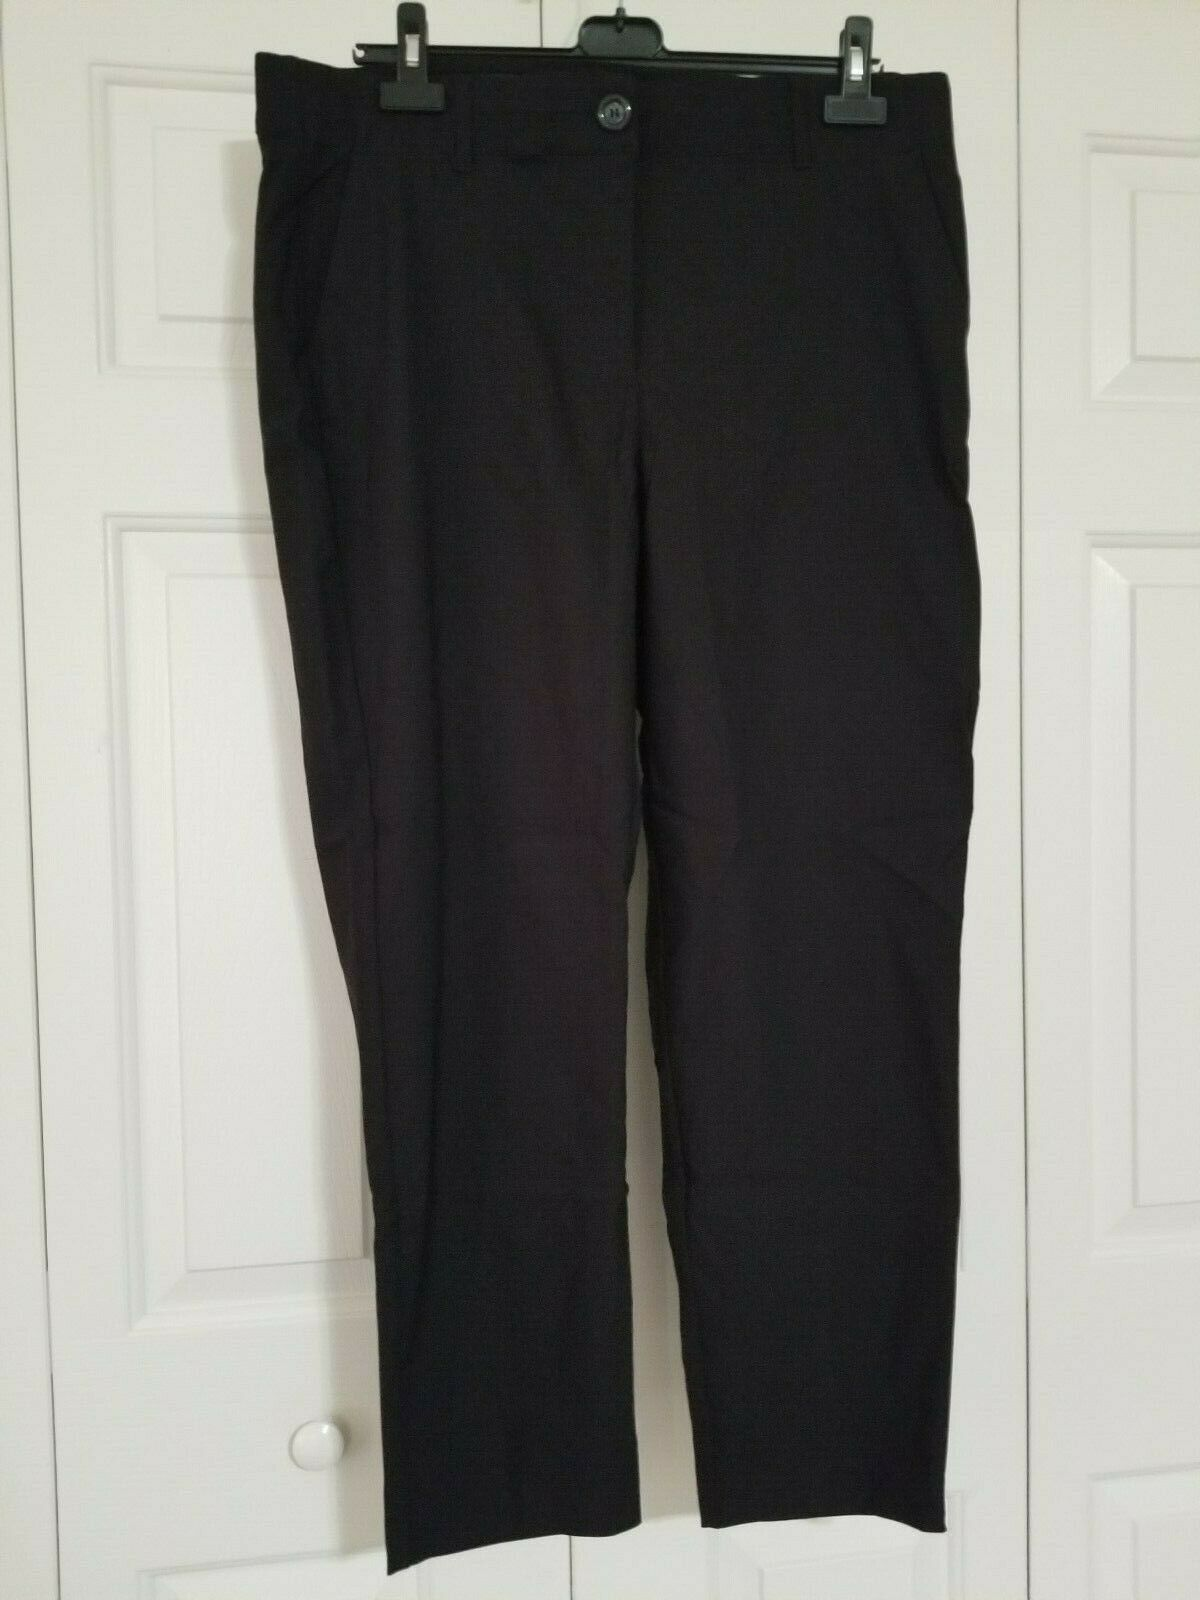 Dia & Co Prescott New York Black Pants Size 16W NWT